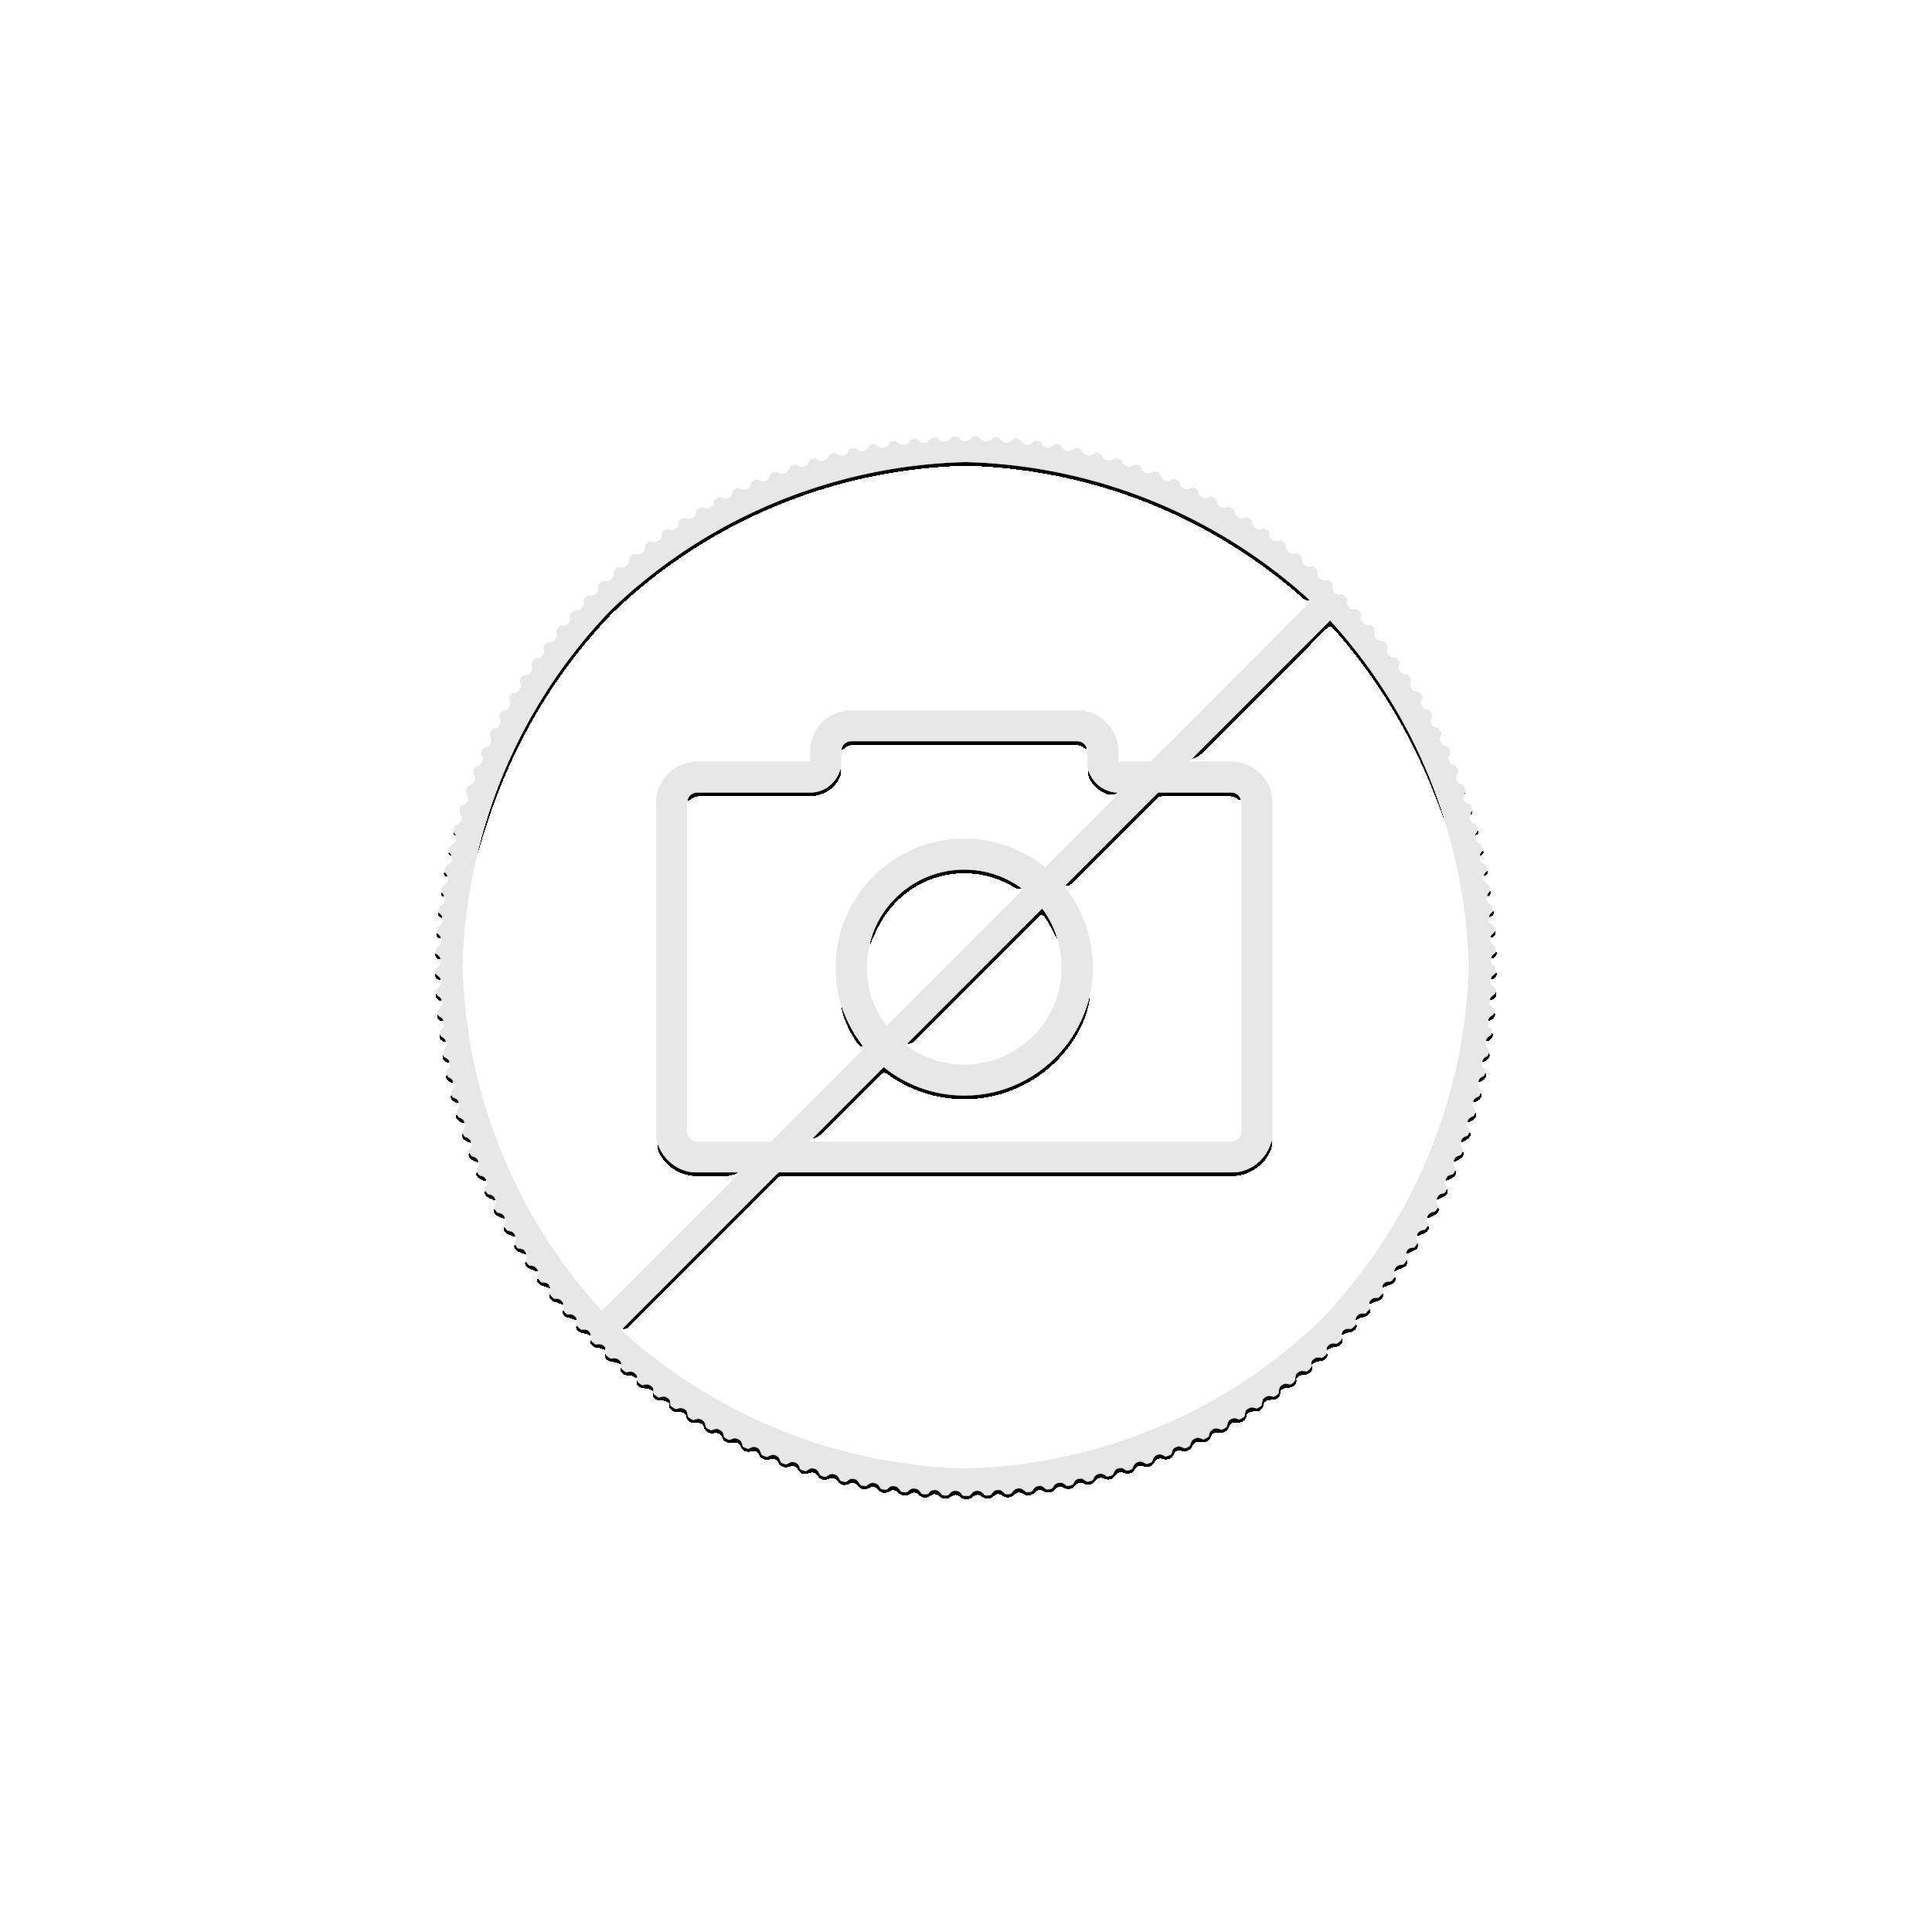 3-piece silver coin set Lunar 2022 Proof